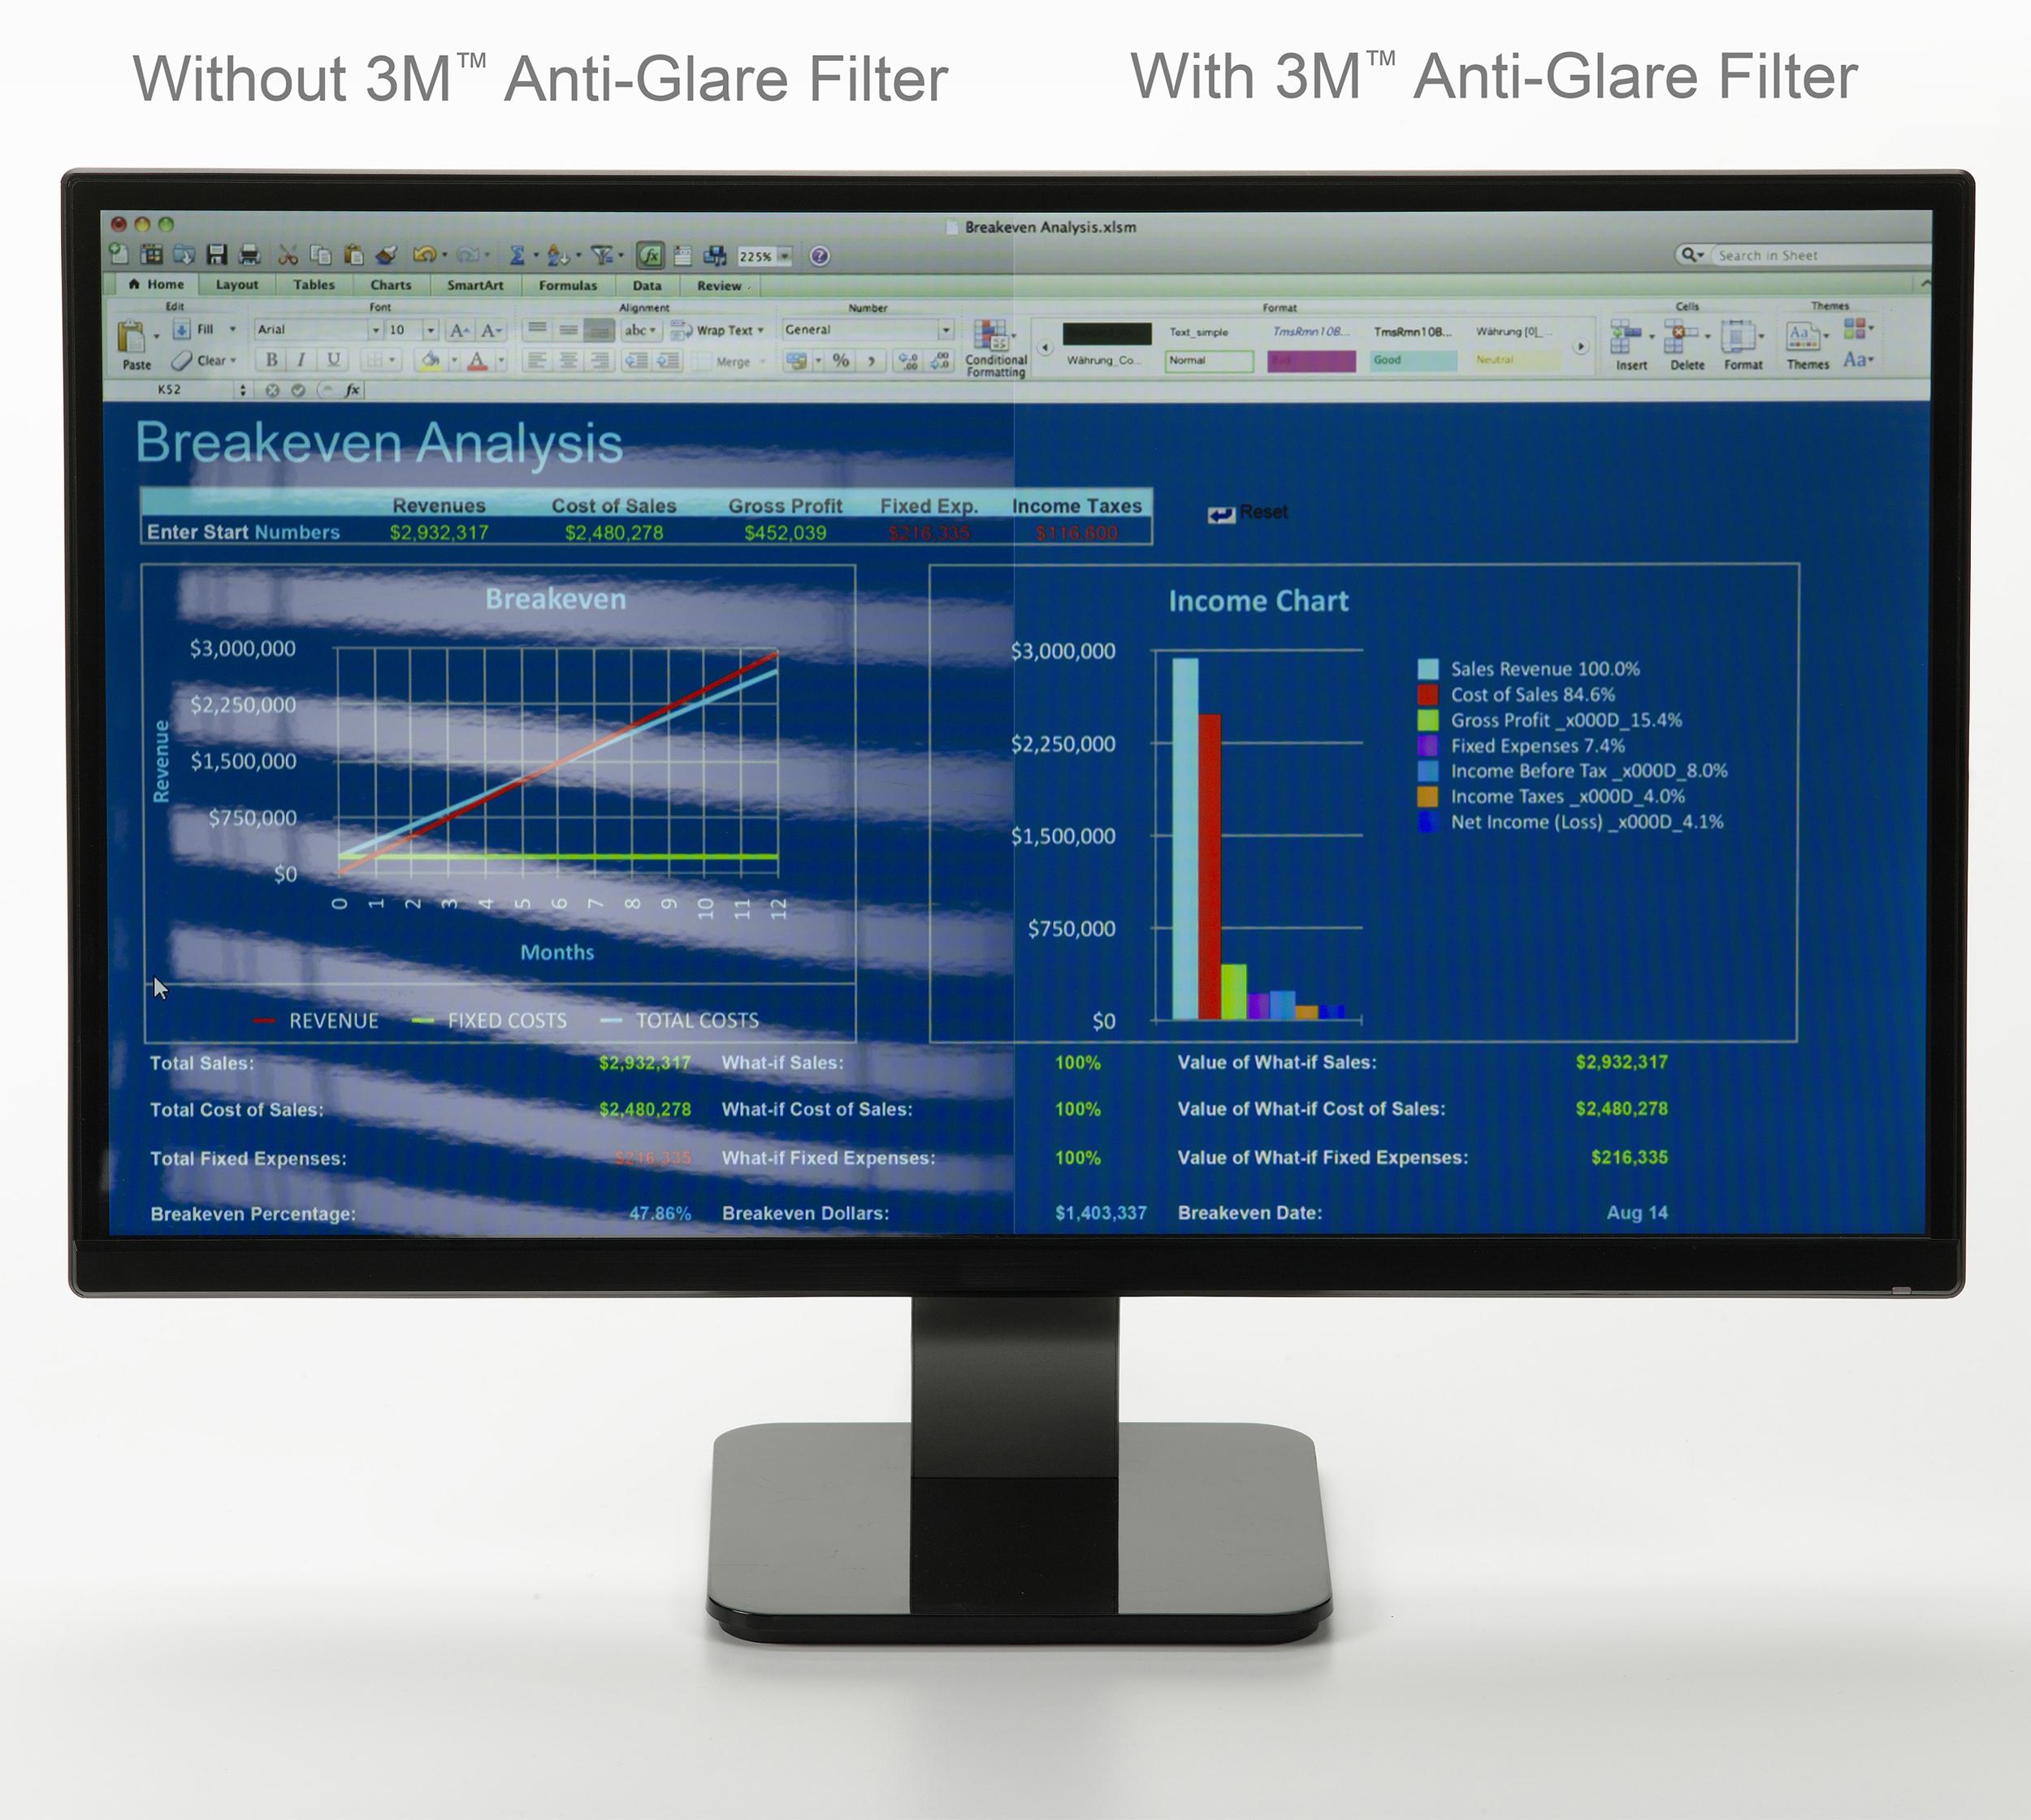 3M Anti-Glare Filter www.3MScreens.com/anti-glare